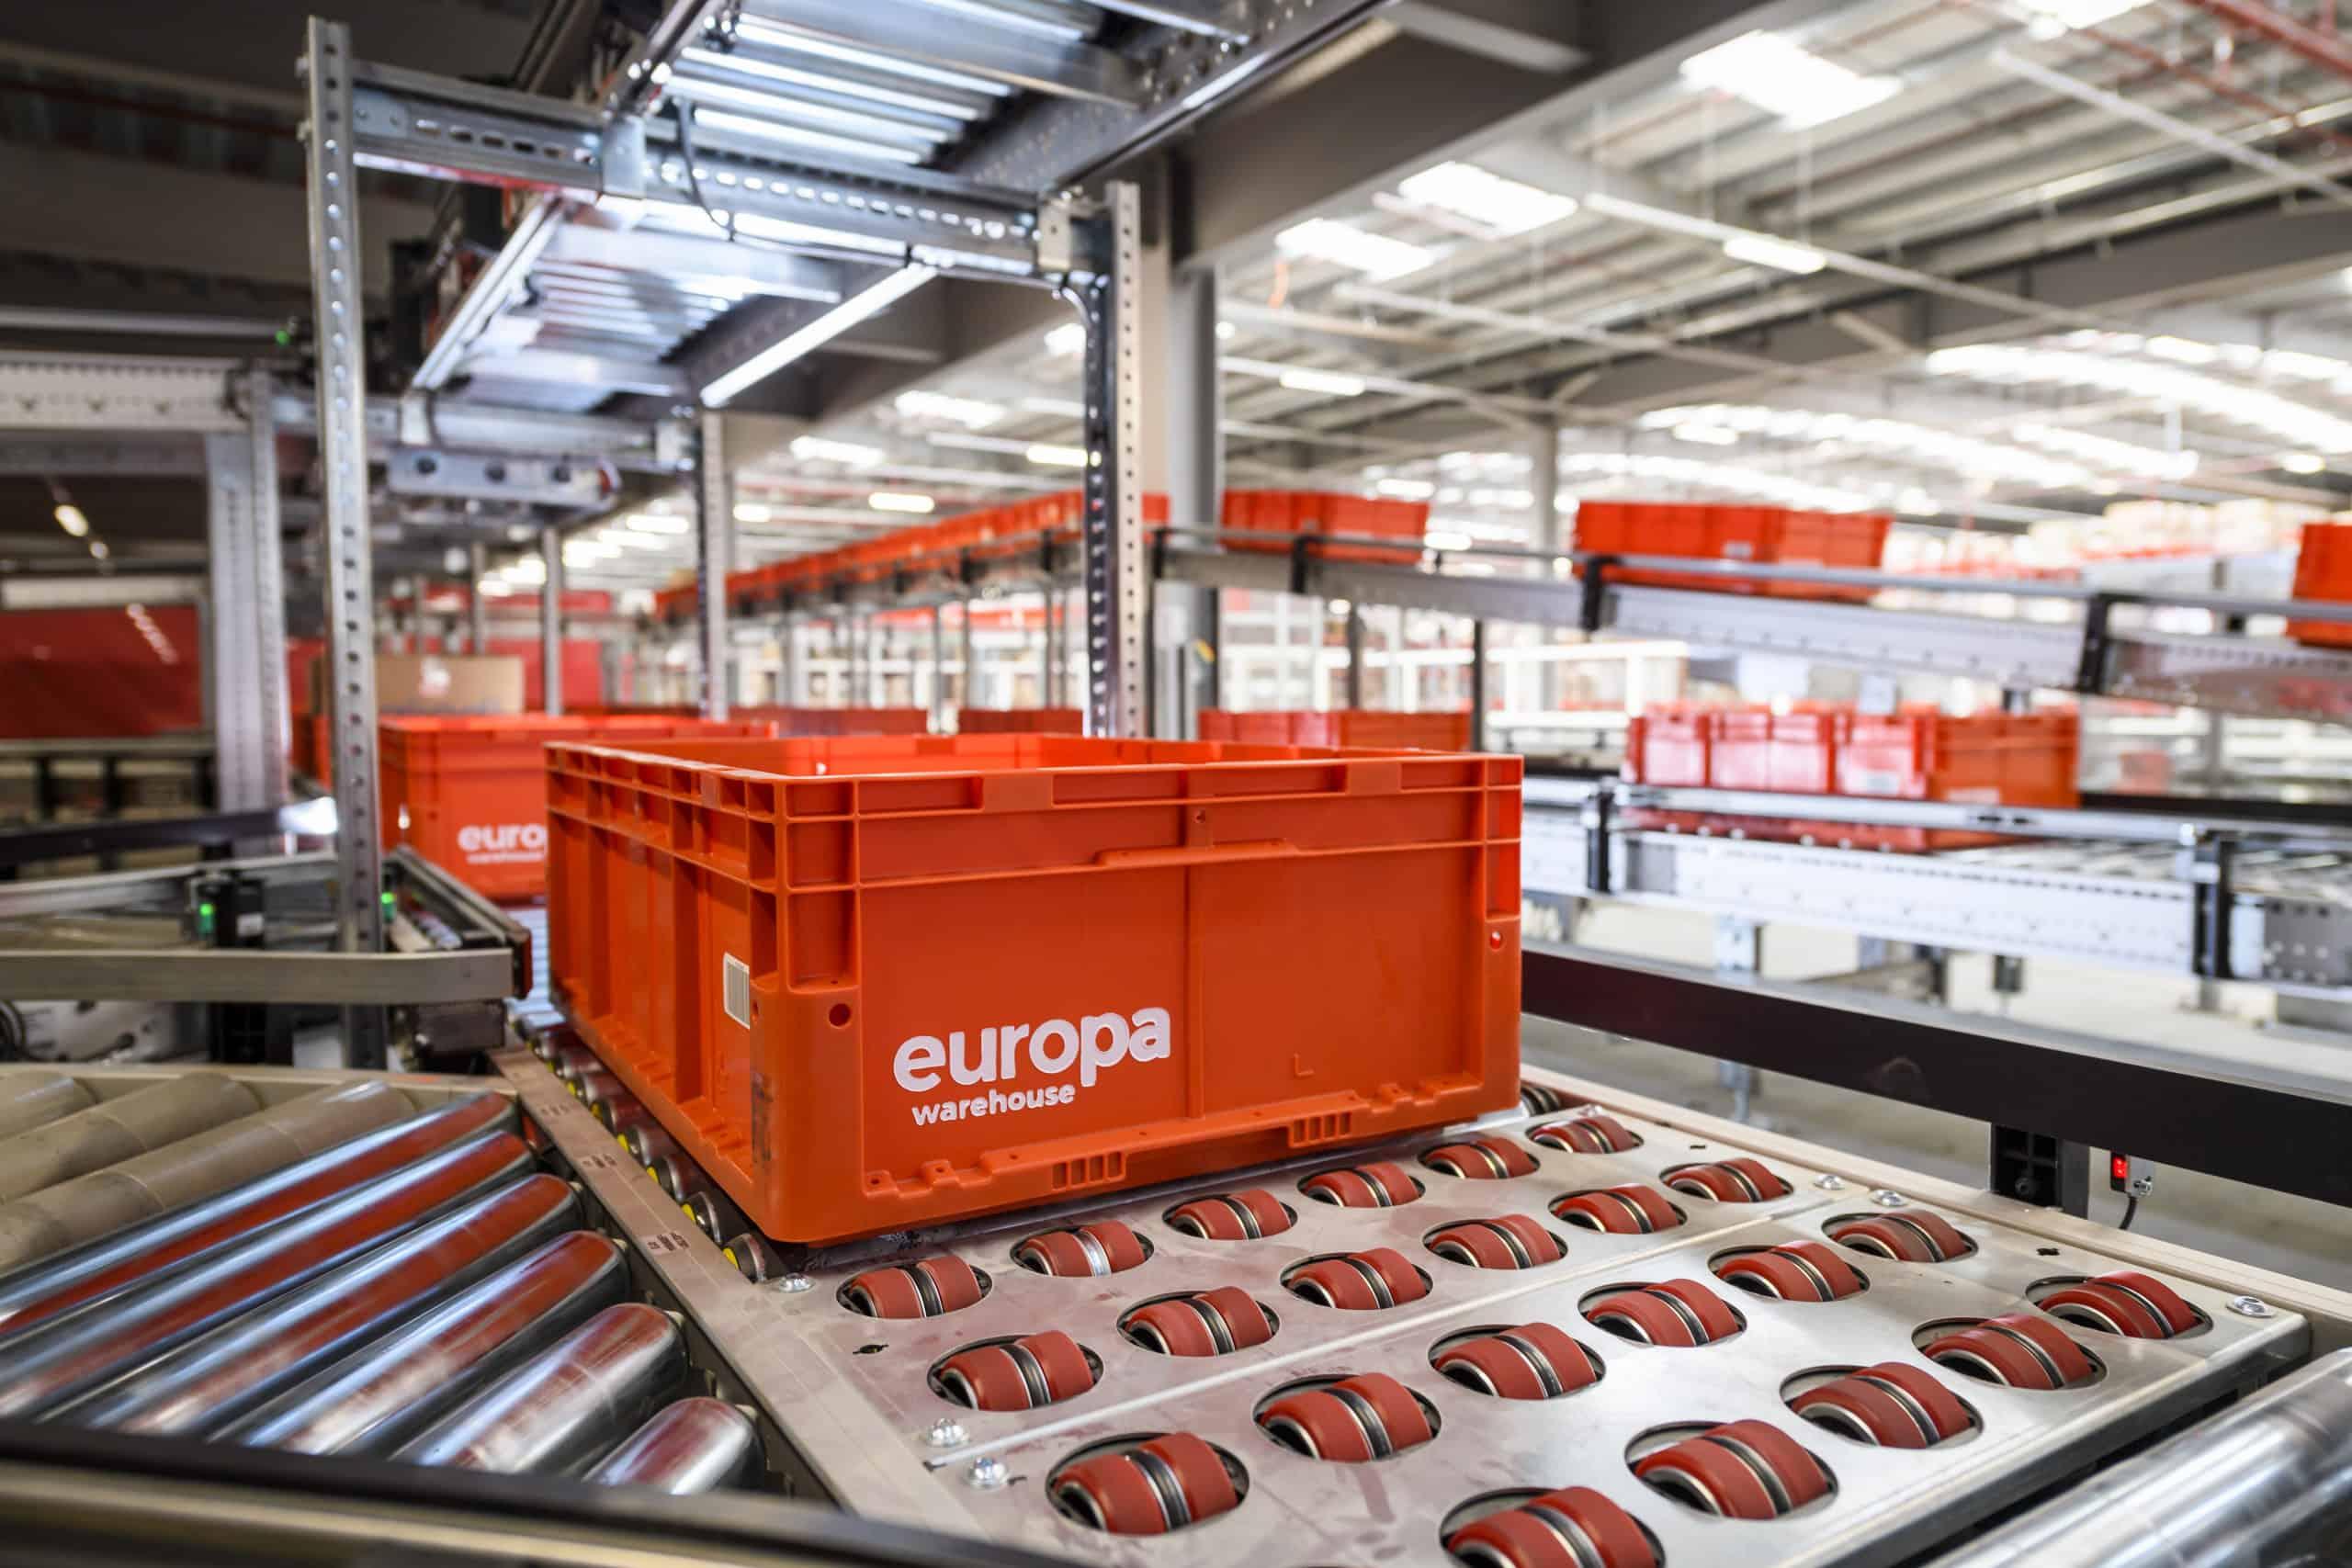 Europa Warehouse Automation